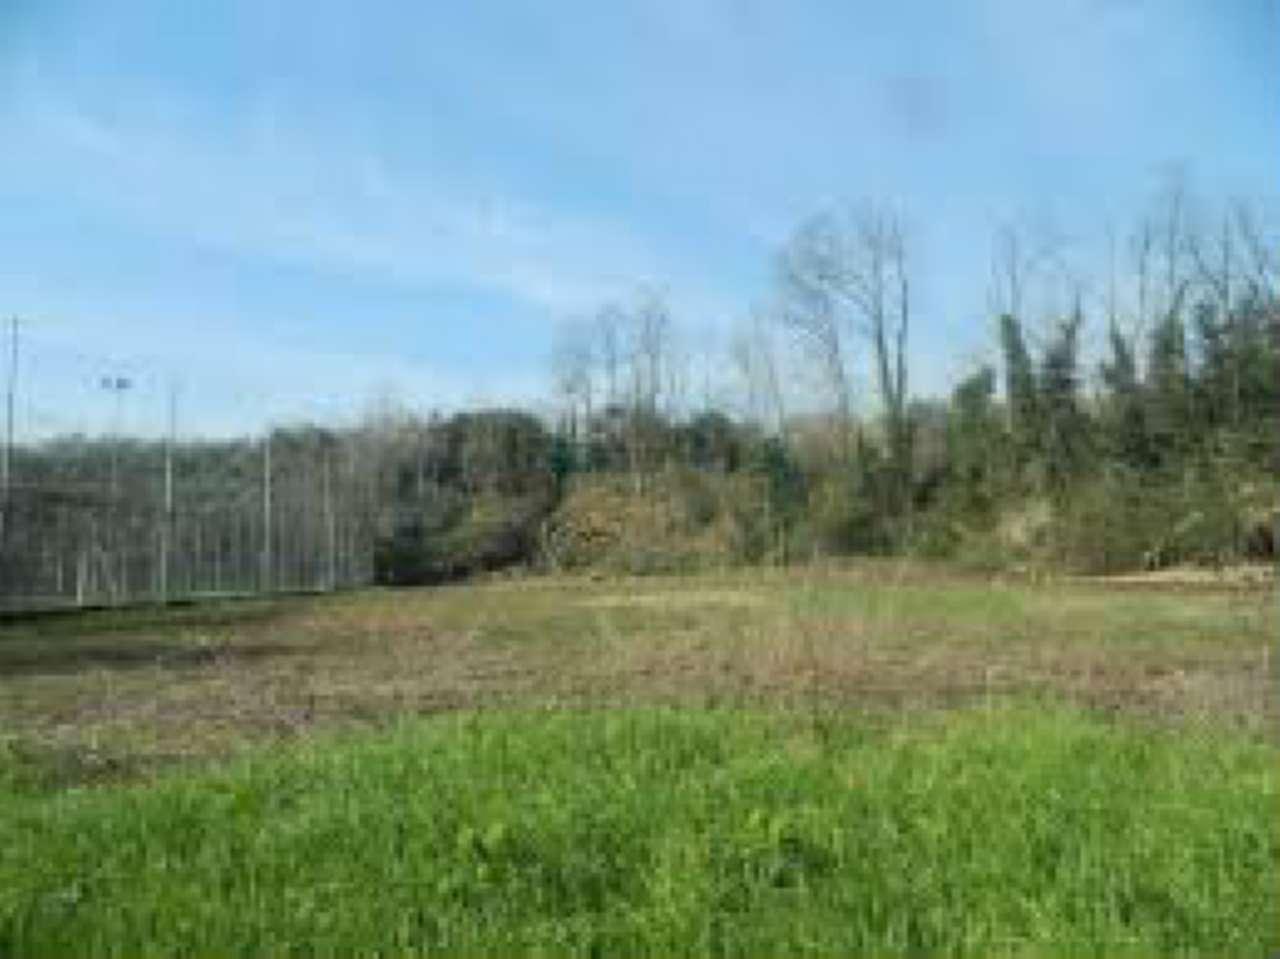 Appartamento in vendita a Pieve a Nievole, 5 locali, Trattative riservate | PortaleAgenzieImmobiliari.it